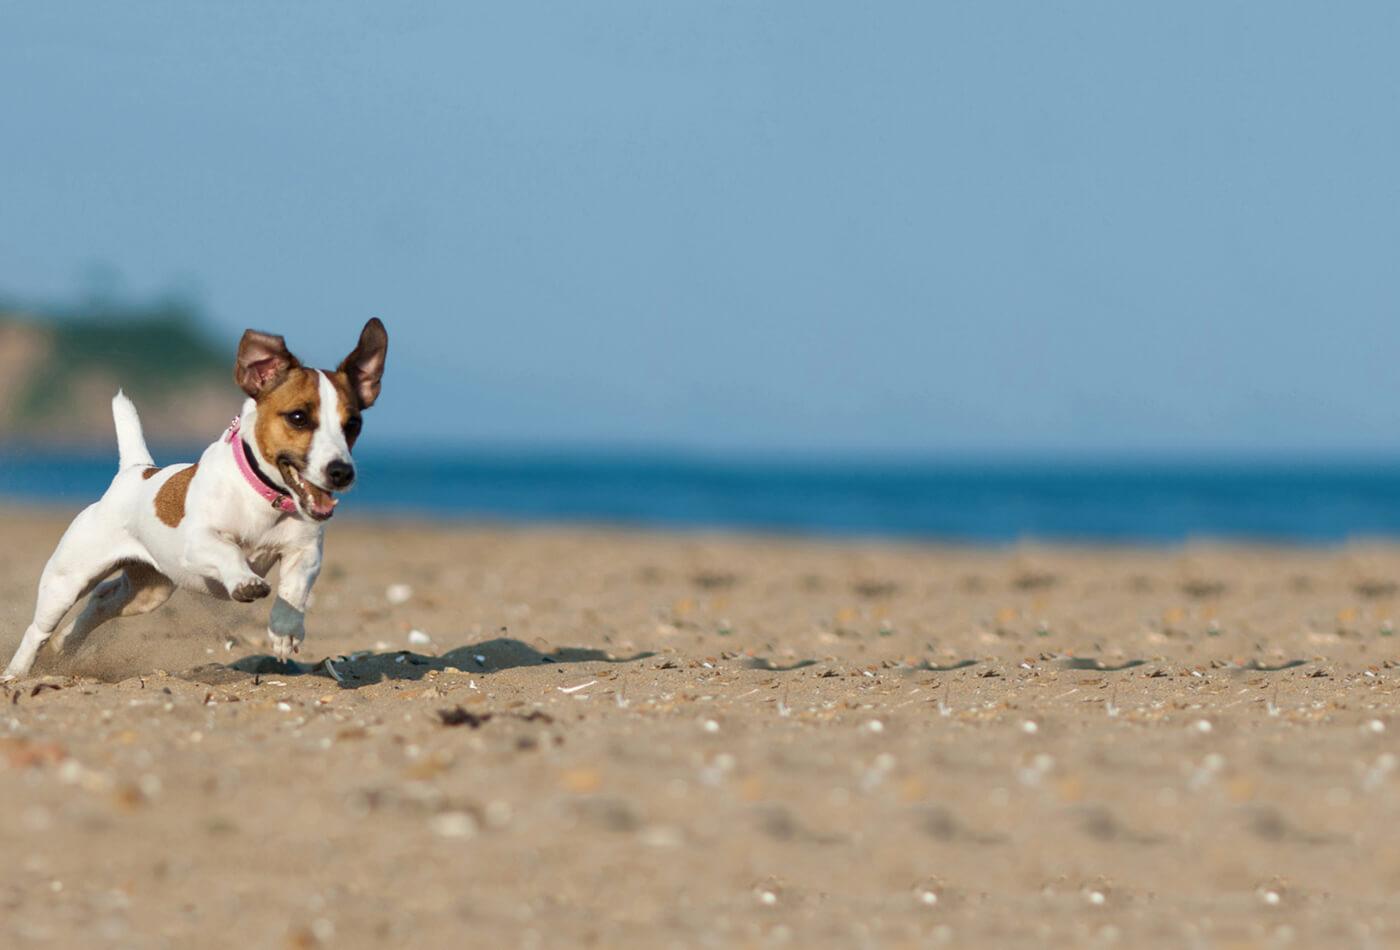 dog friendly destinations - dog running on beach